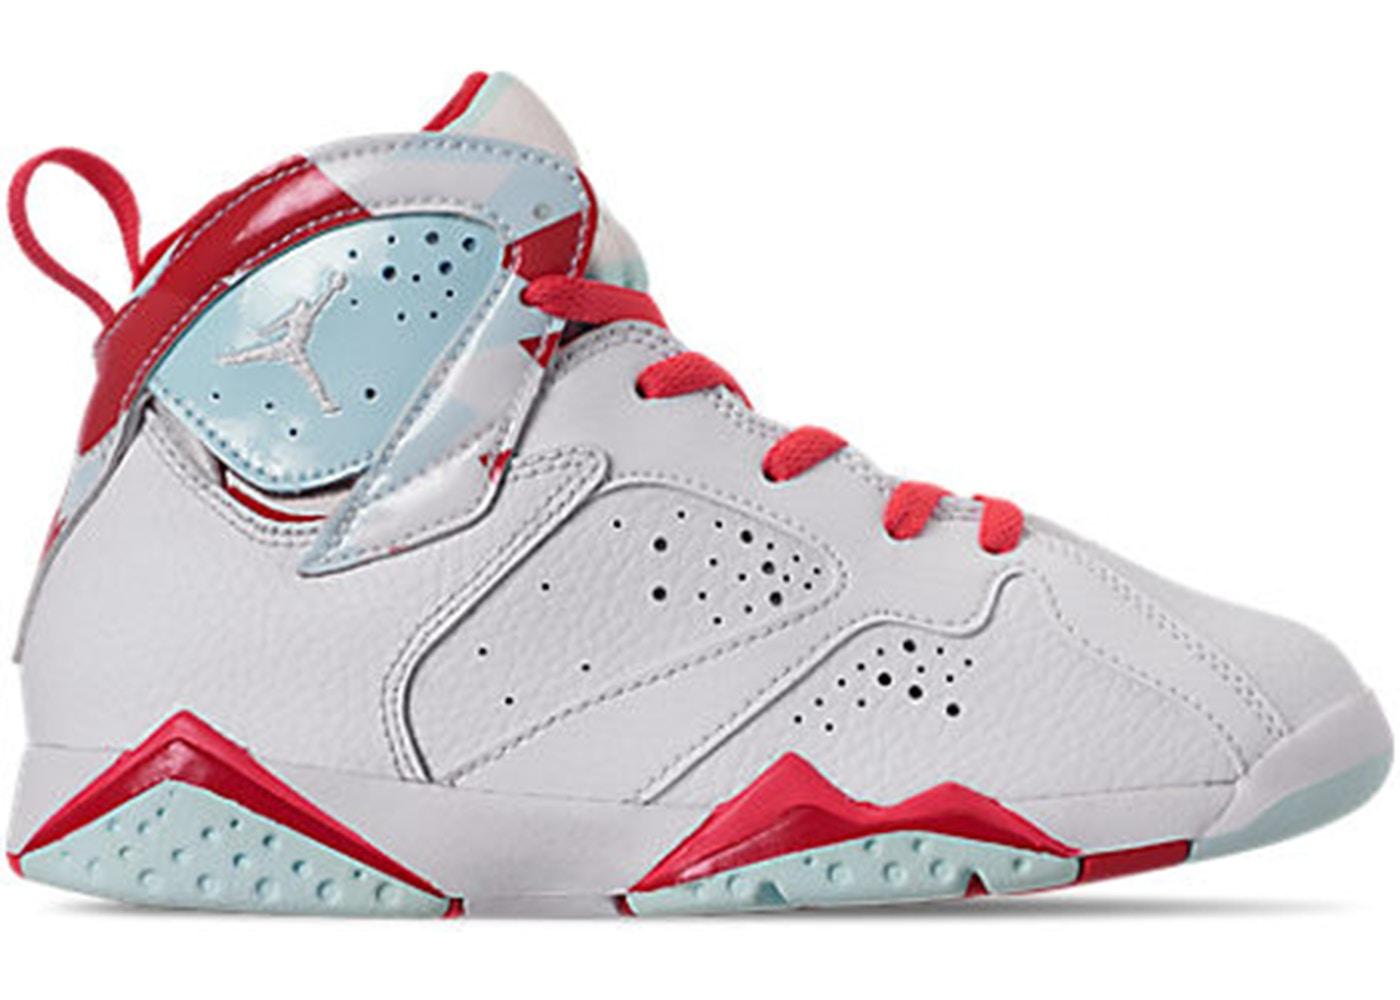 huge selection of d6621 3a98d Air Jordan 7 Shoes - Release Date